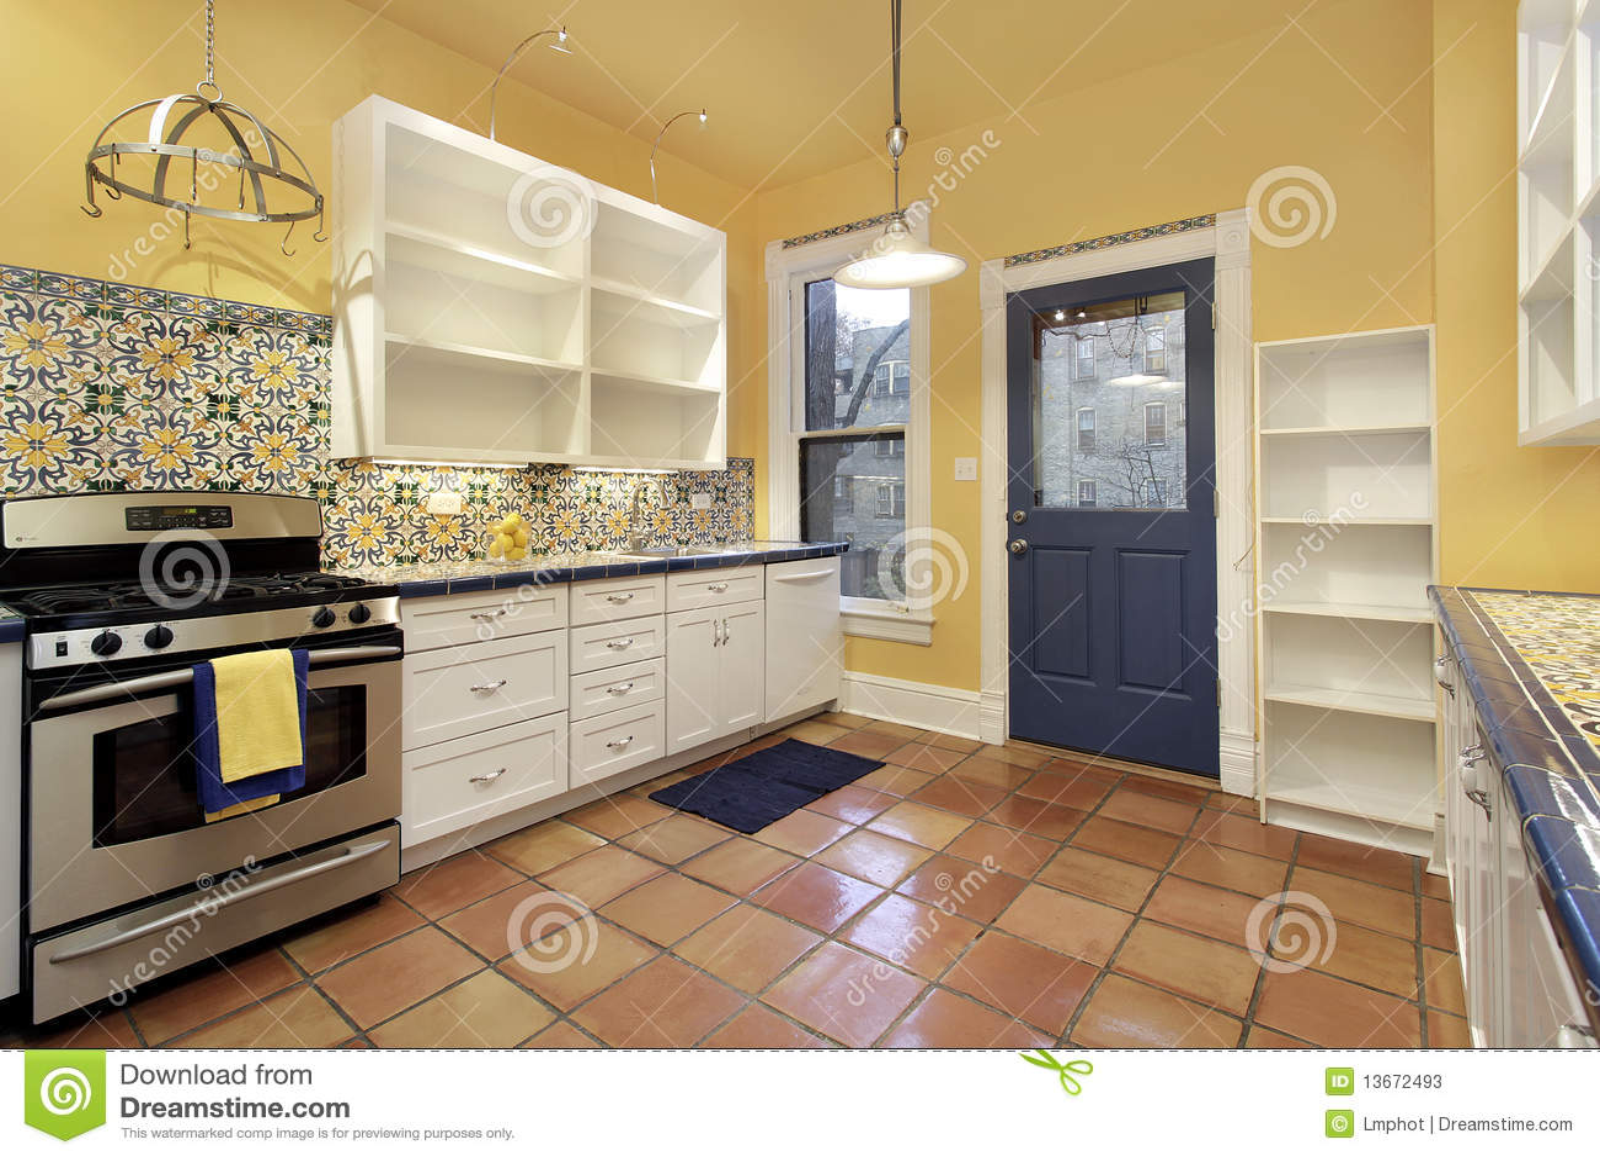 Kitchen With Terra Cotta Floor Tile Stock Photos Image